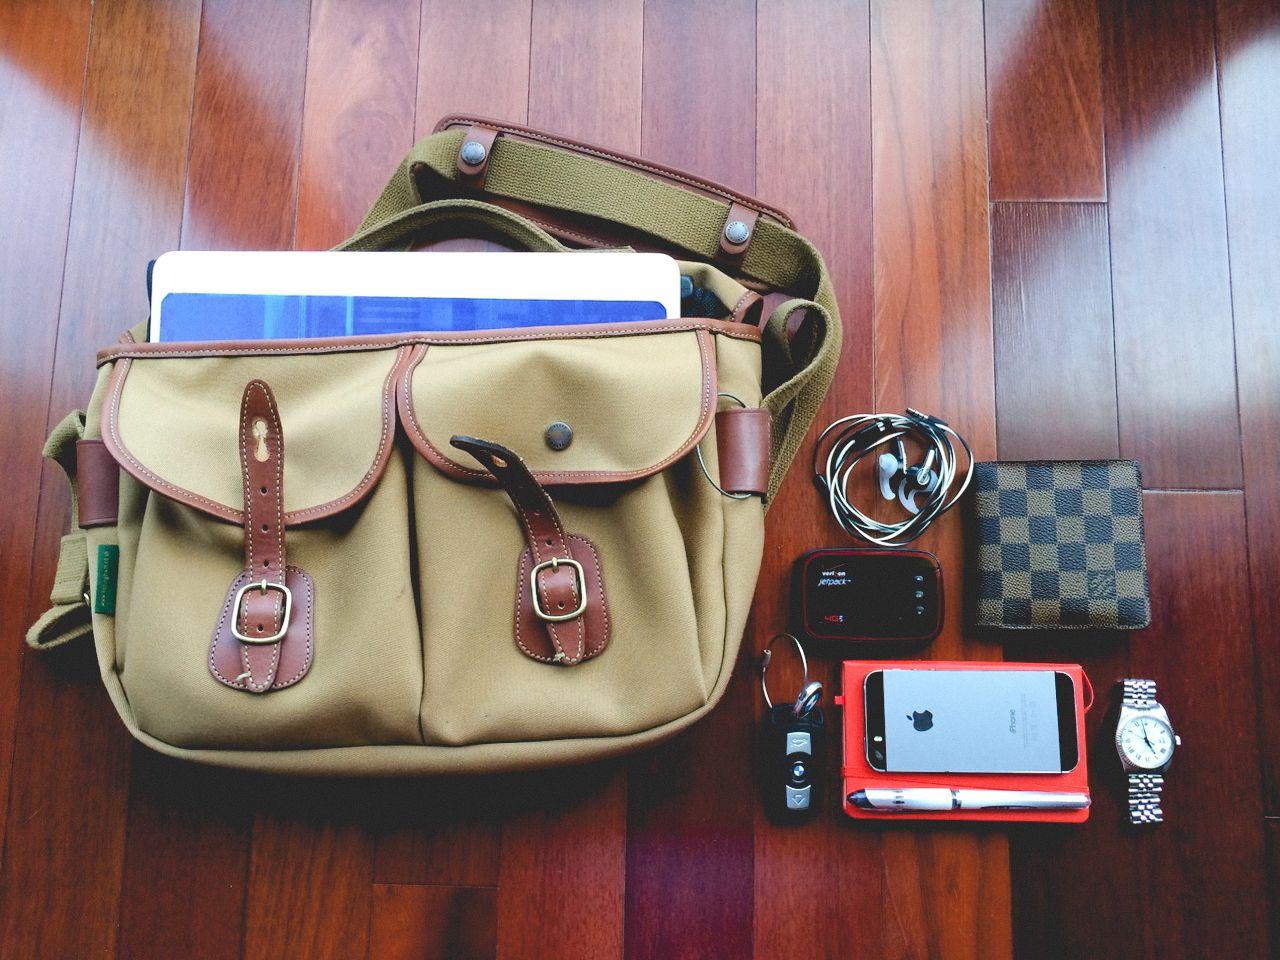 Billingham Hadley Pro 259 Sf Bags Sleeve Case Everyday Carry Shoulder Bag Khaki Chocolate Leather